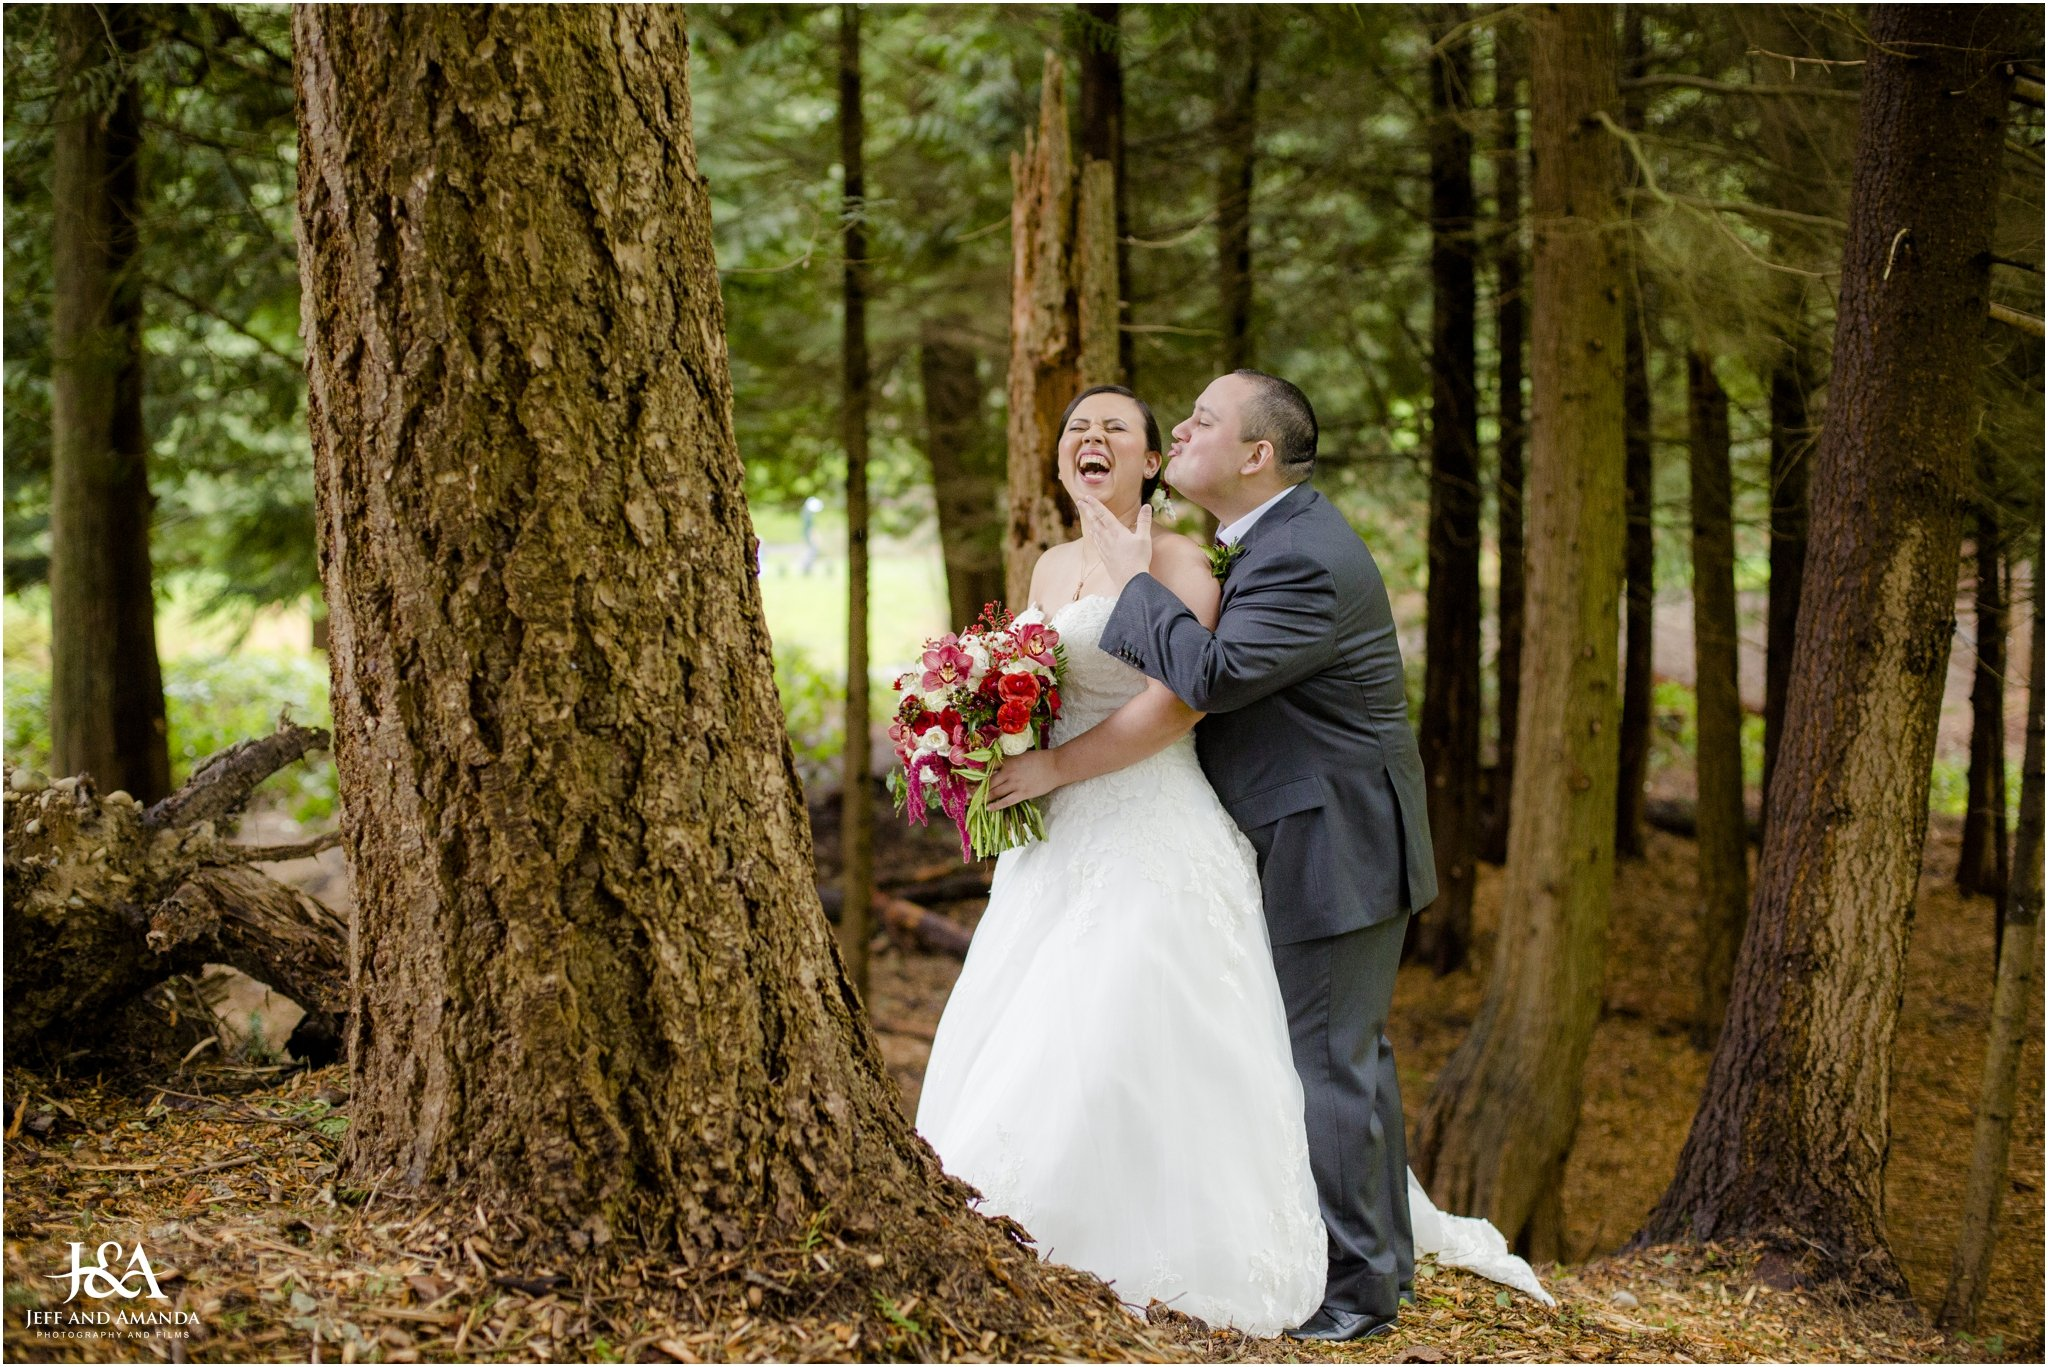 Dave and Kari s Wedding-Facebook Ready-0149.jpg